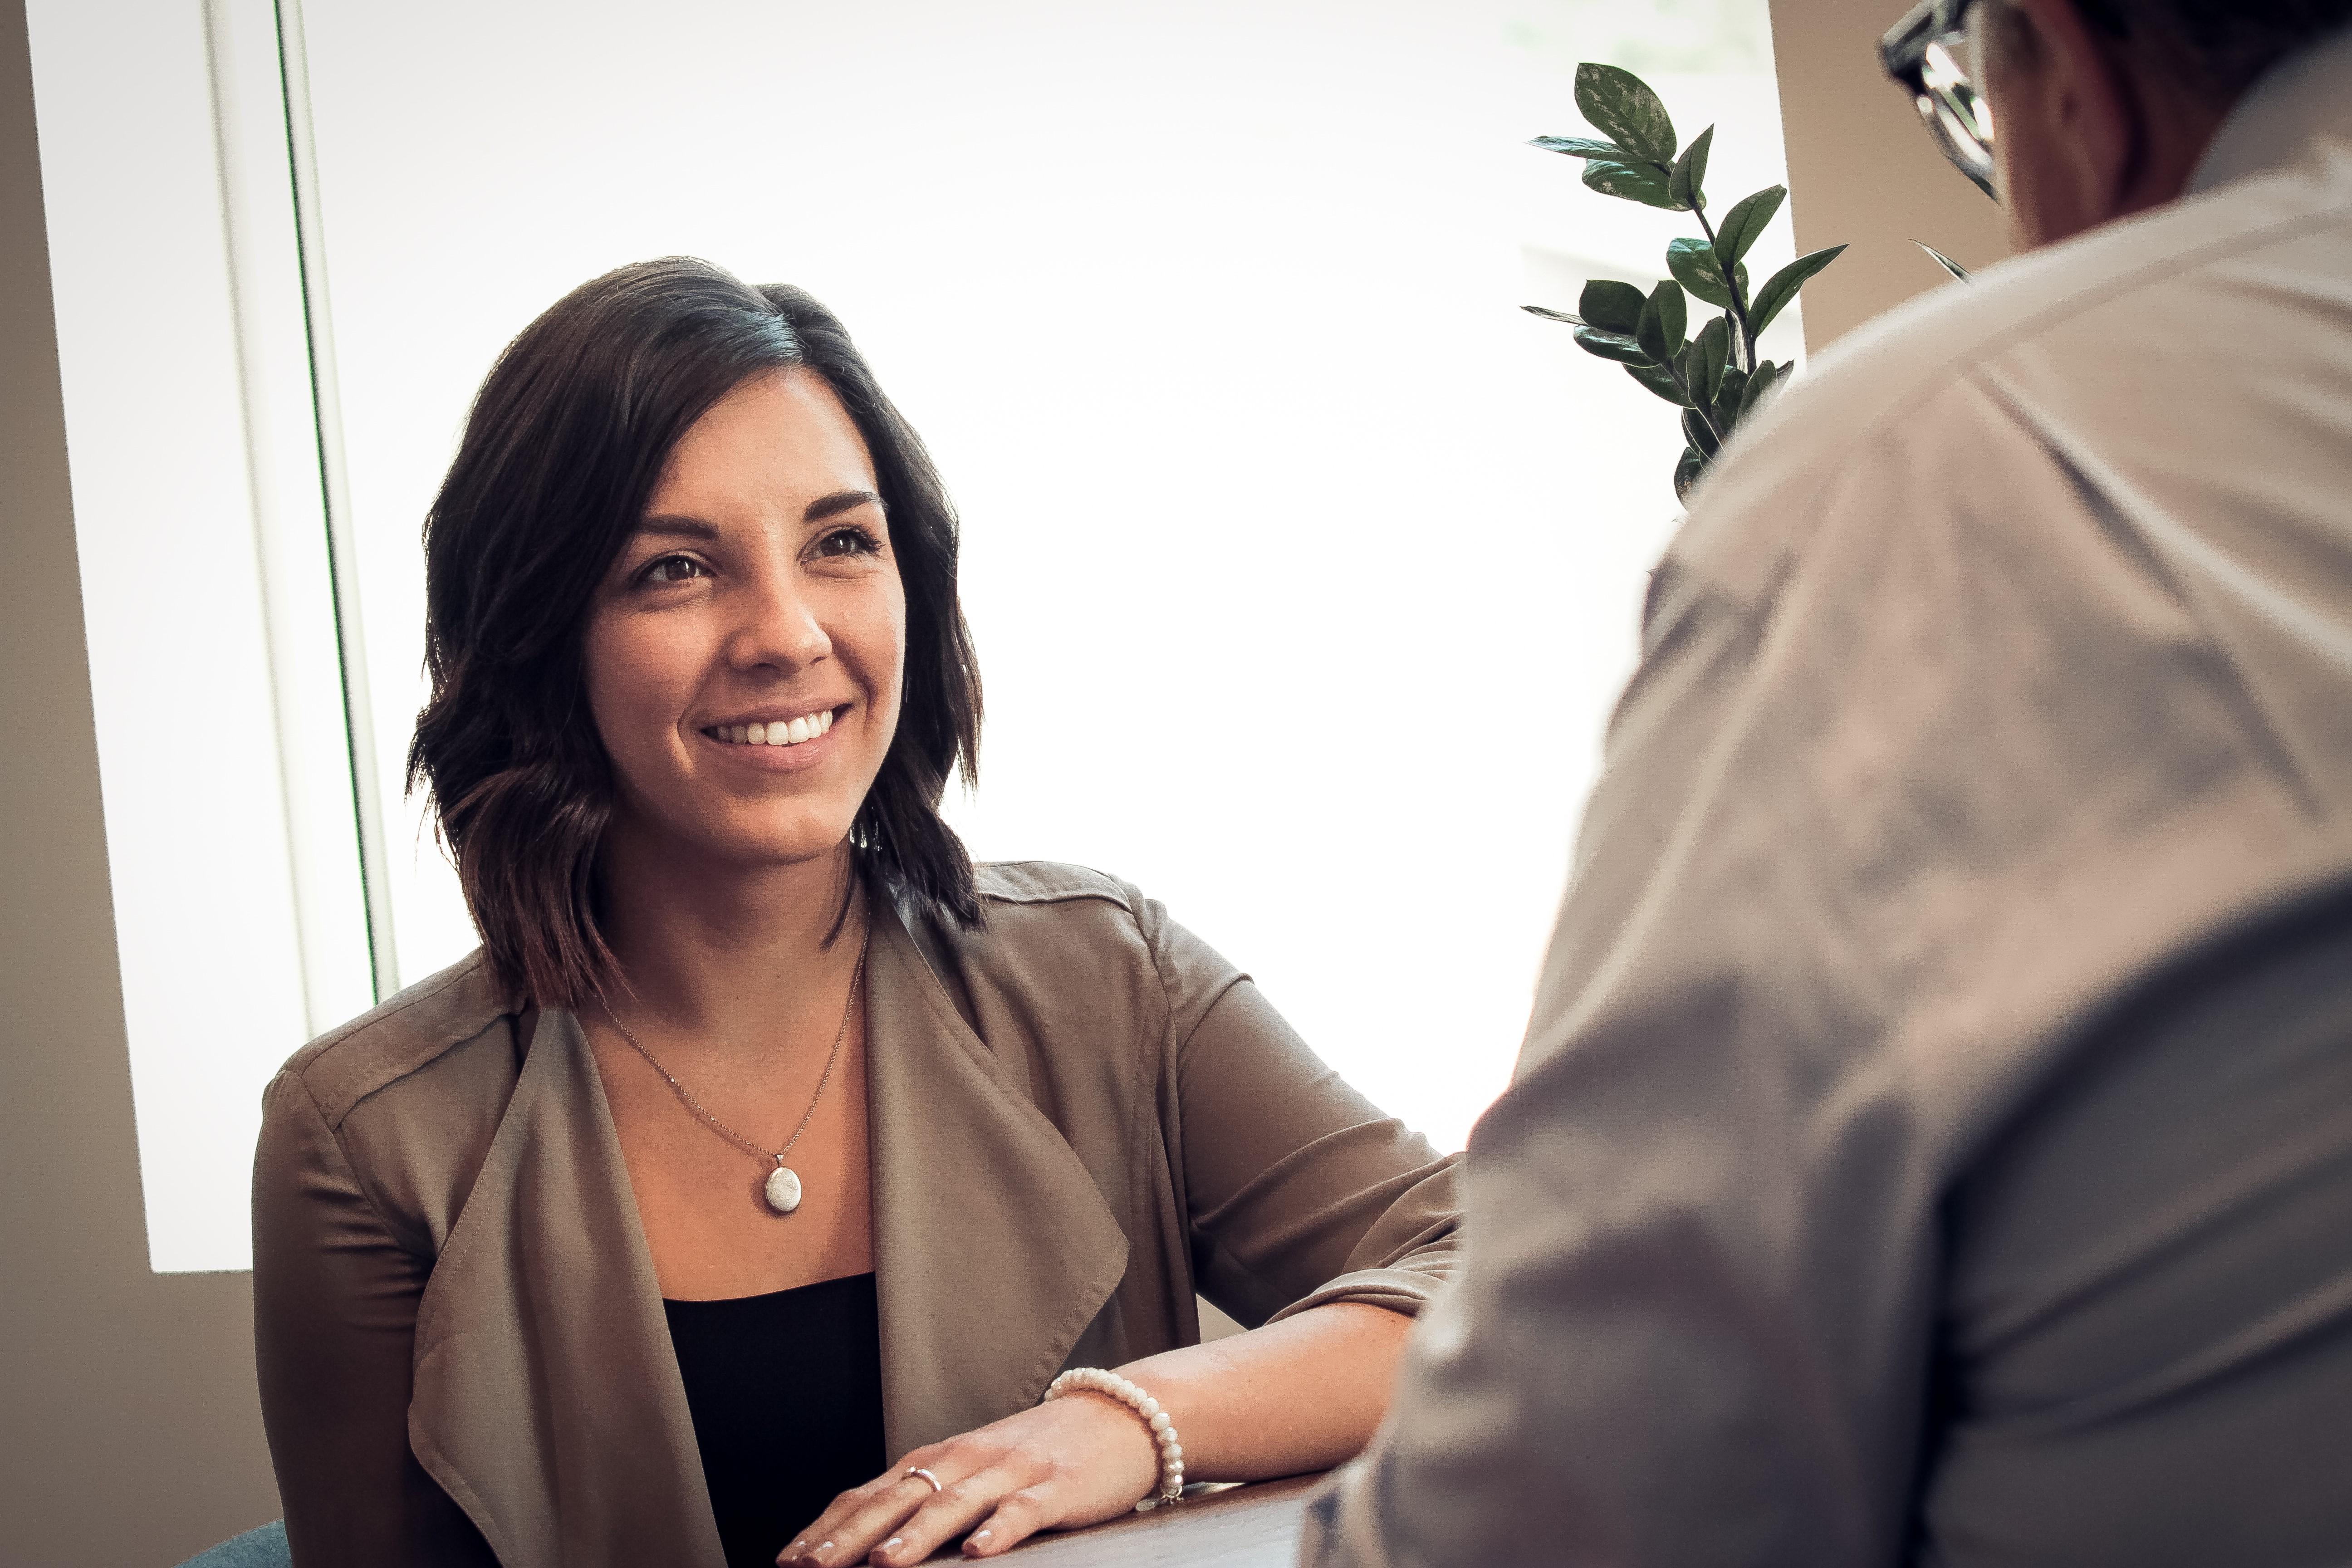 7 Ways to Be a Better Interviewer